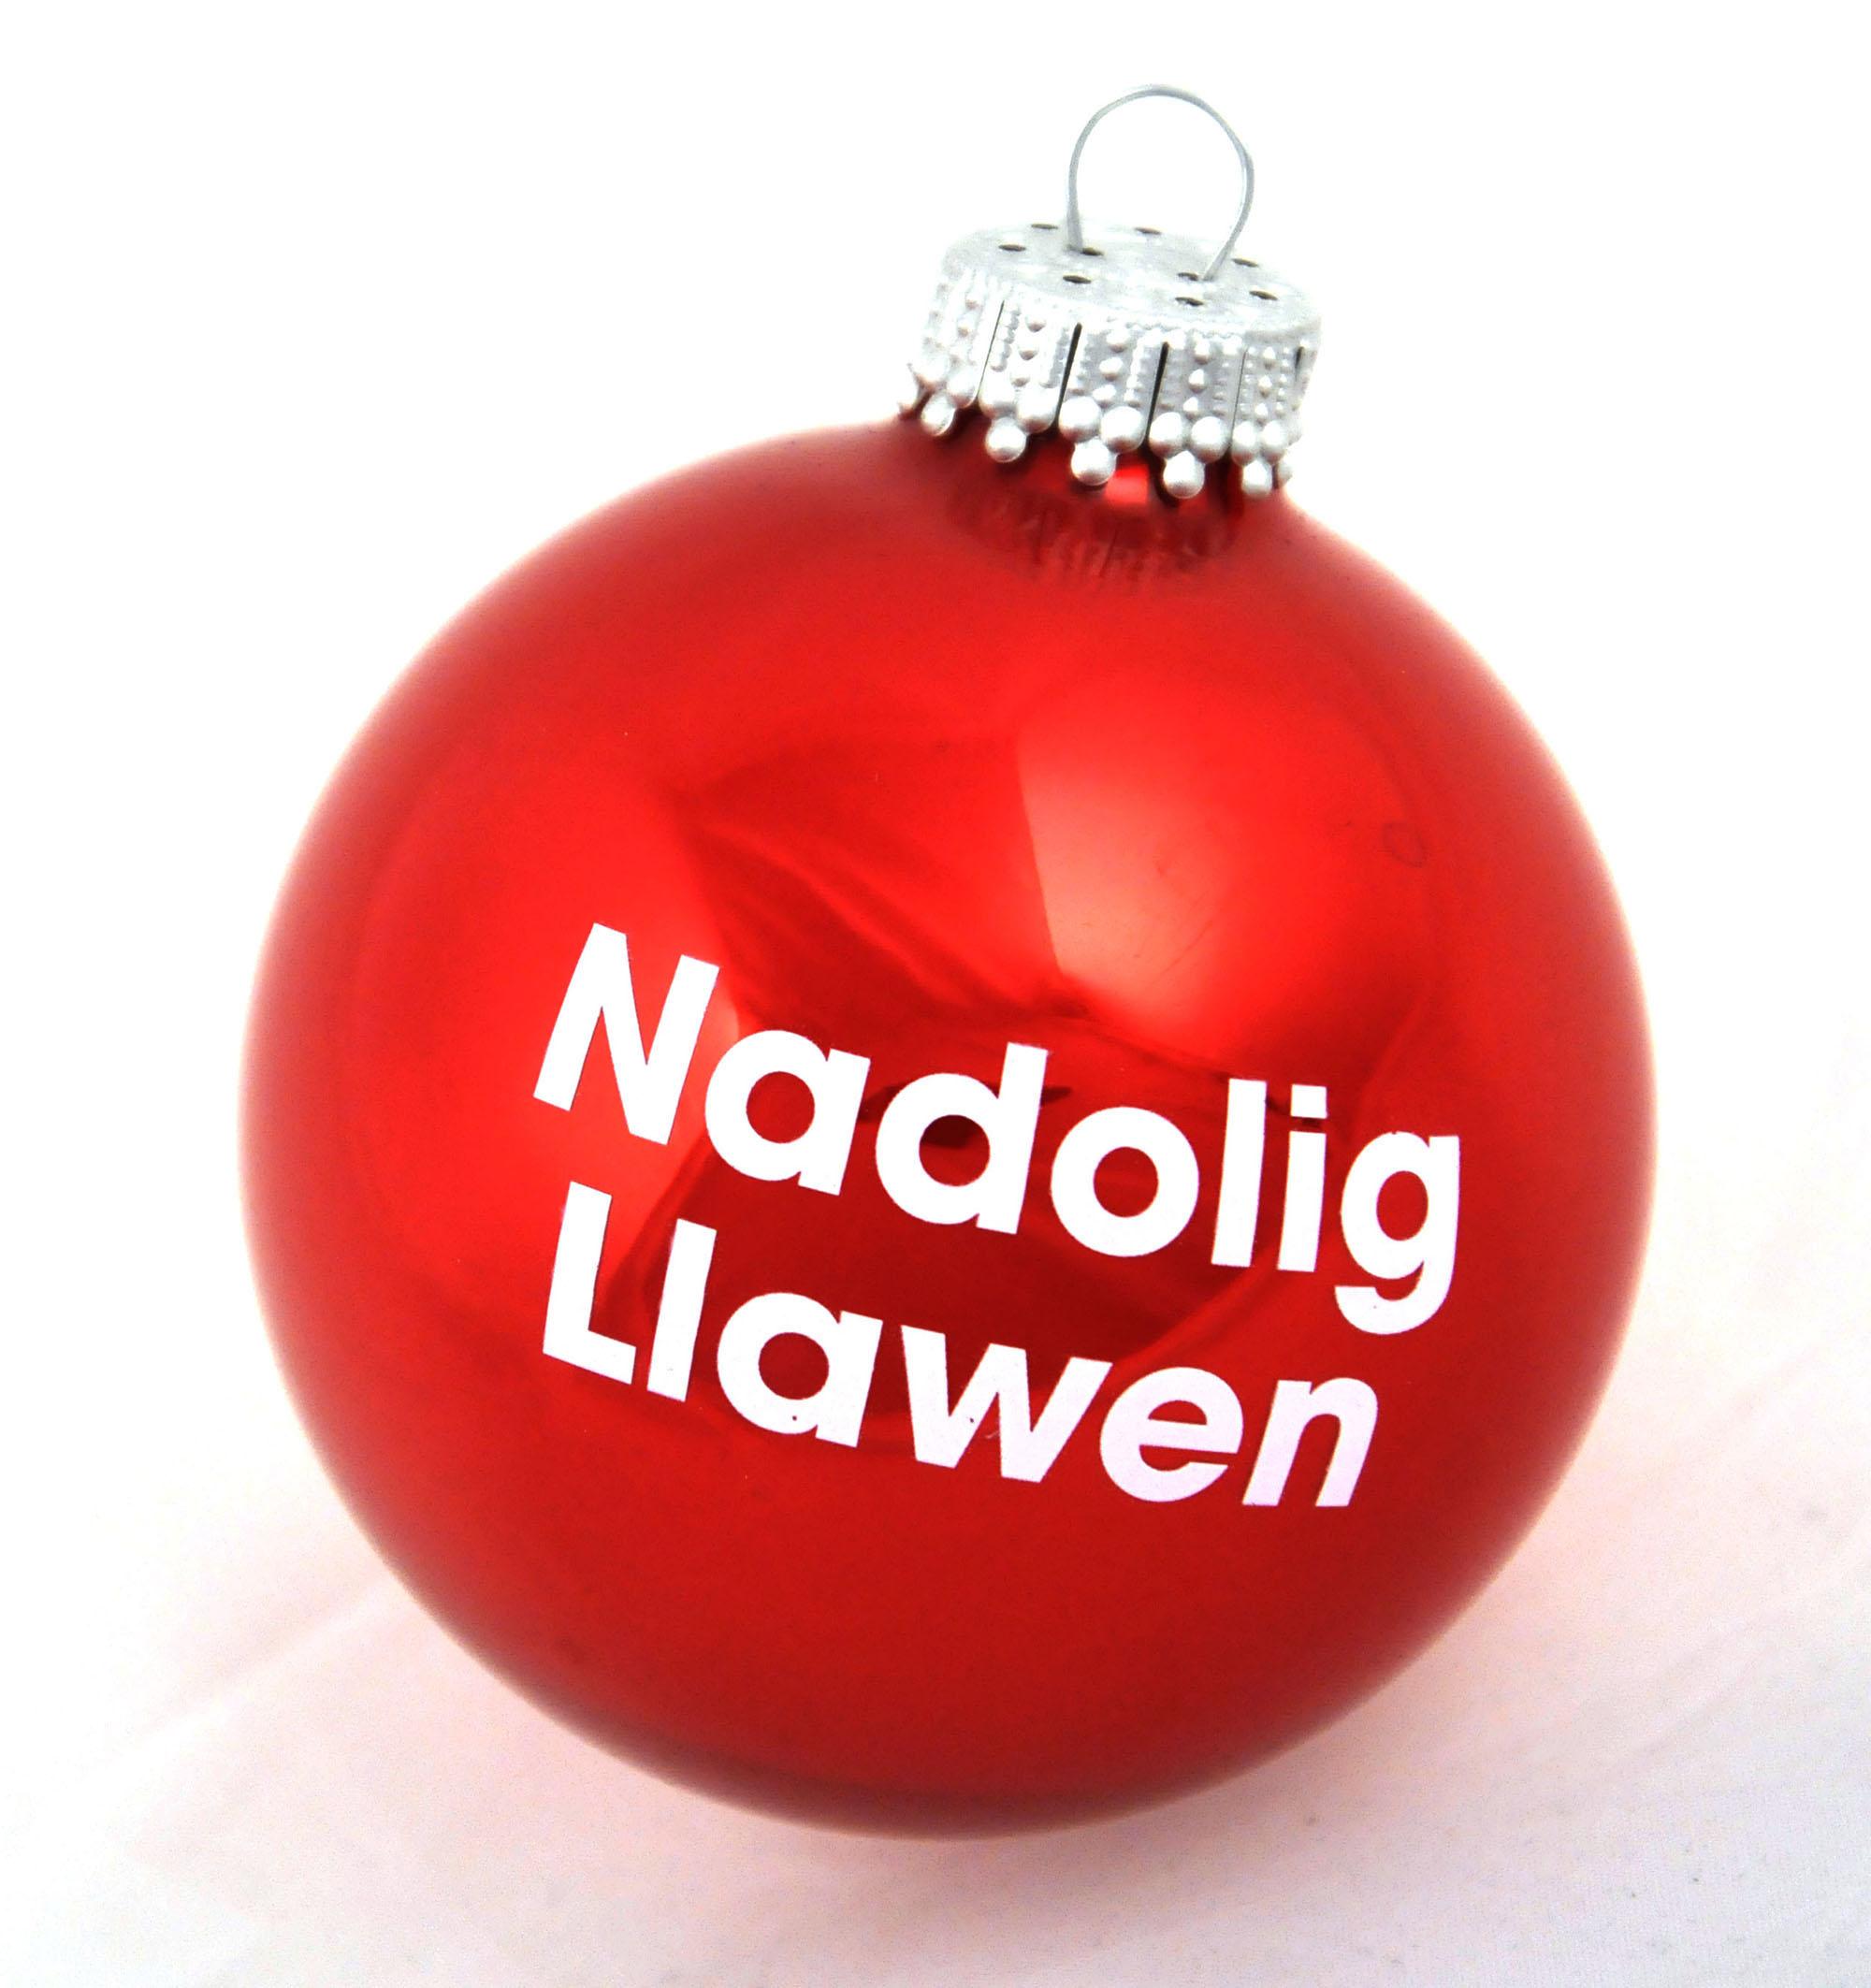 Welsh Christmas Red Bauble Nadolig Llawen Happy